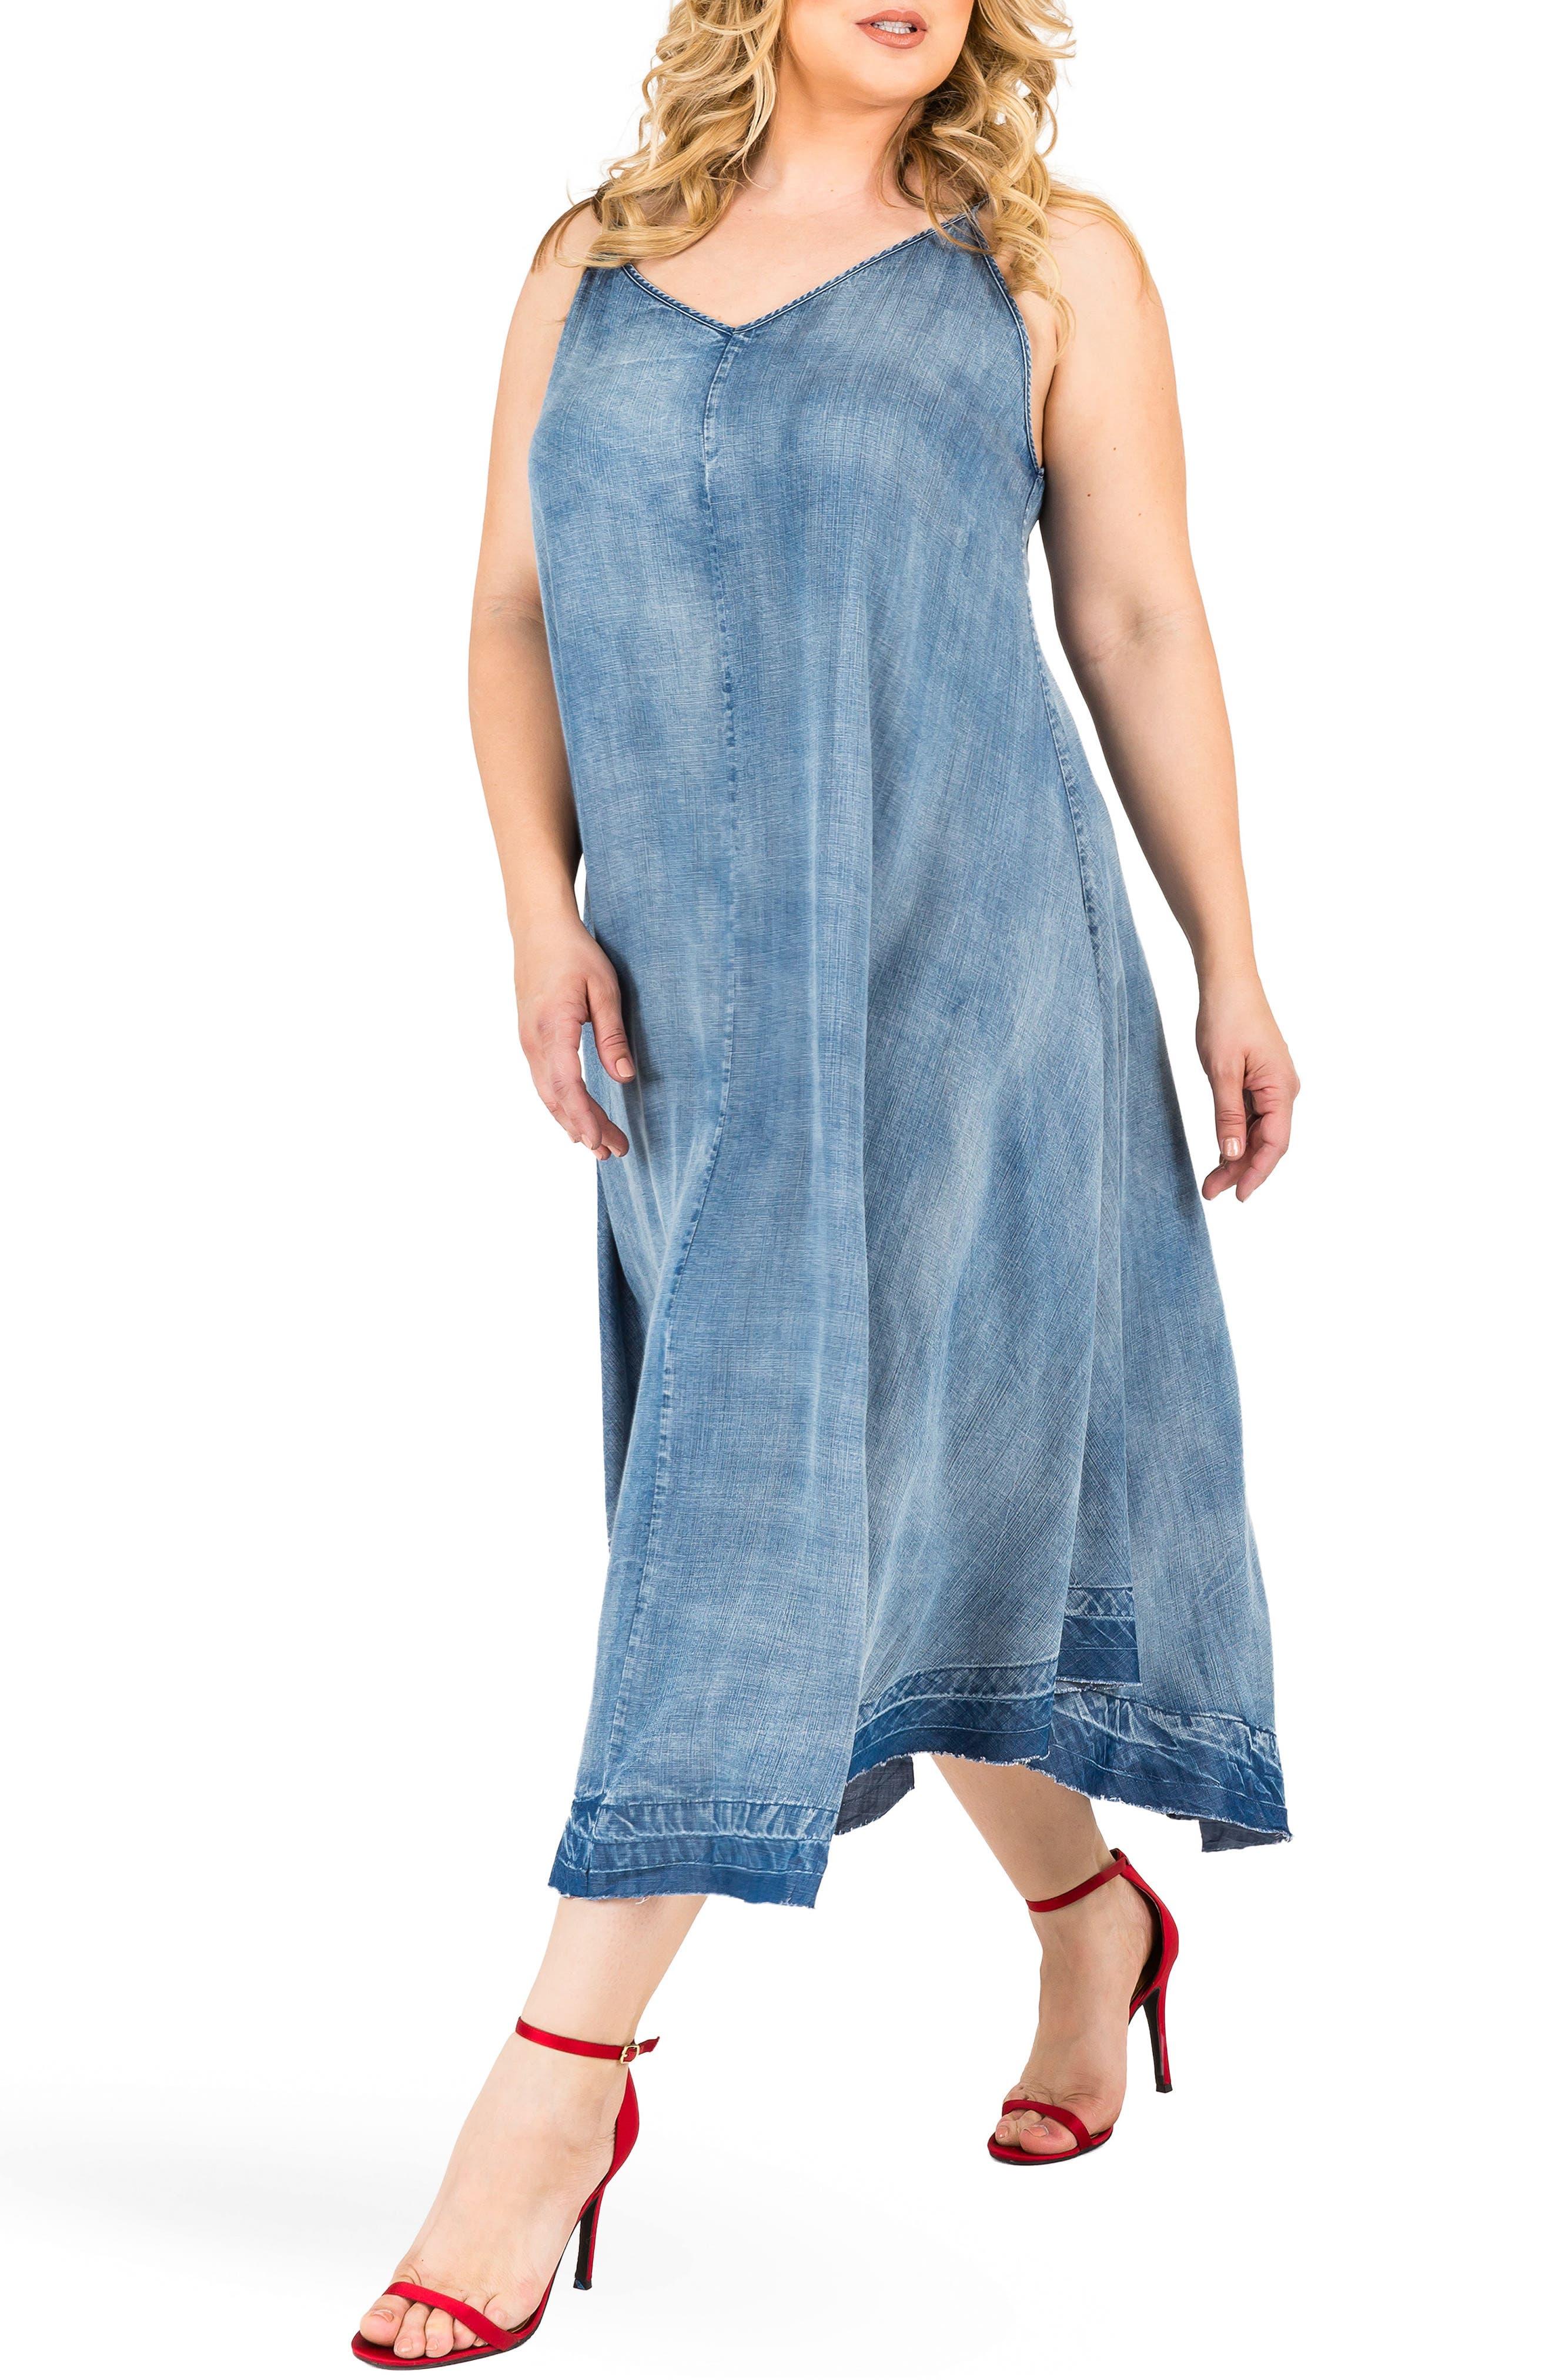 Taylor Tank Denim Midi Dress,                         Main,                         color, Medium Blue